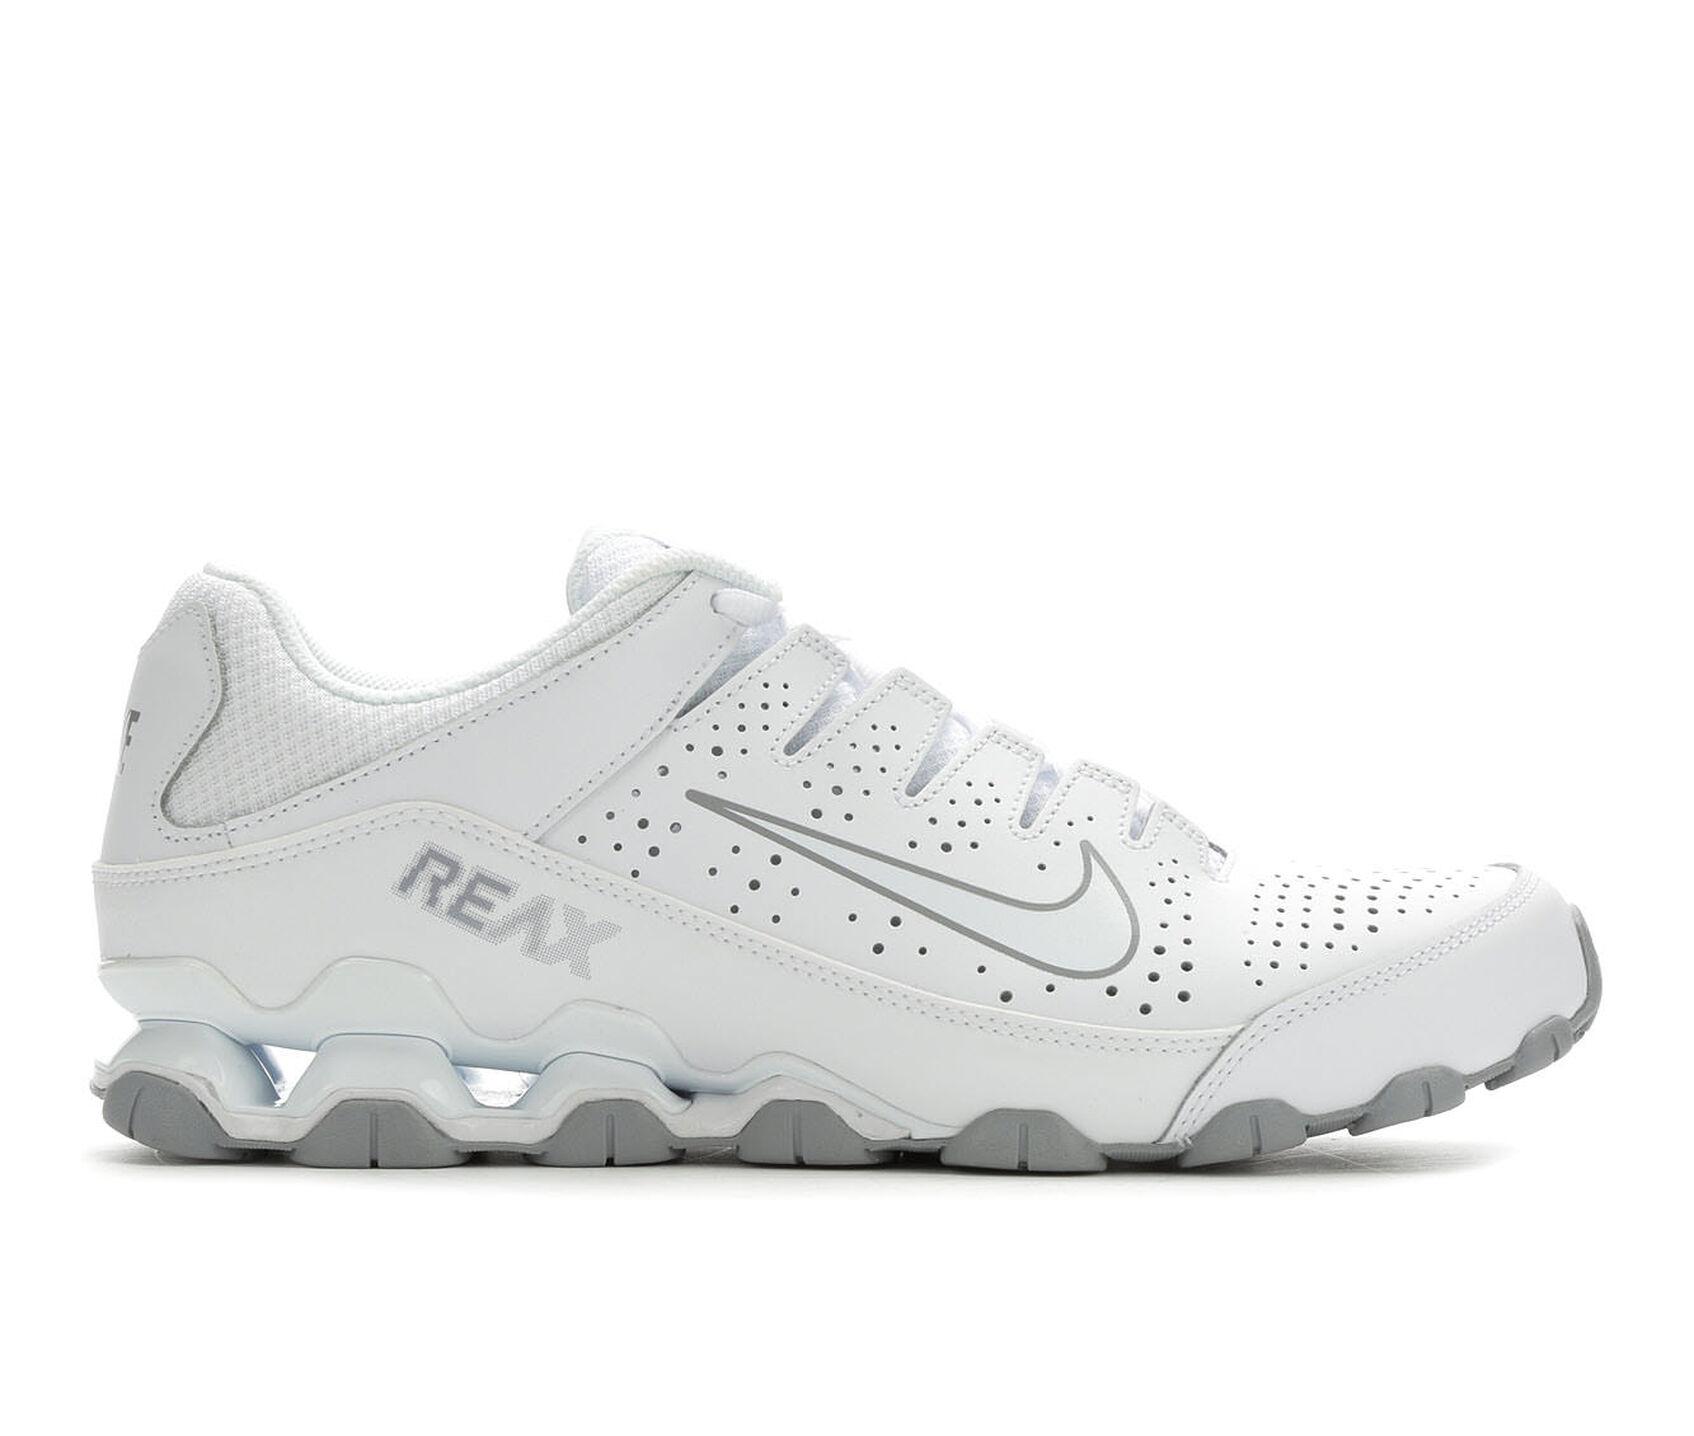 583e23644952 ... Nike Reax 8 TR Training Shoes. Previous